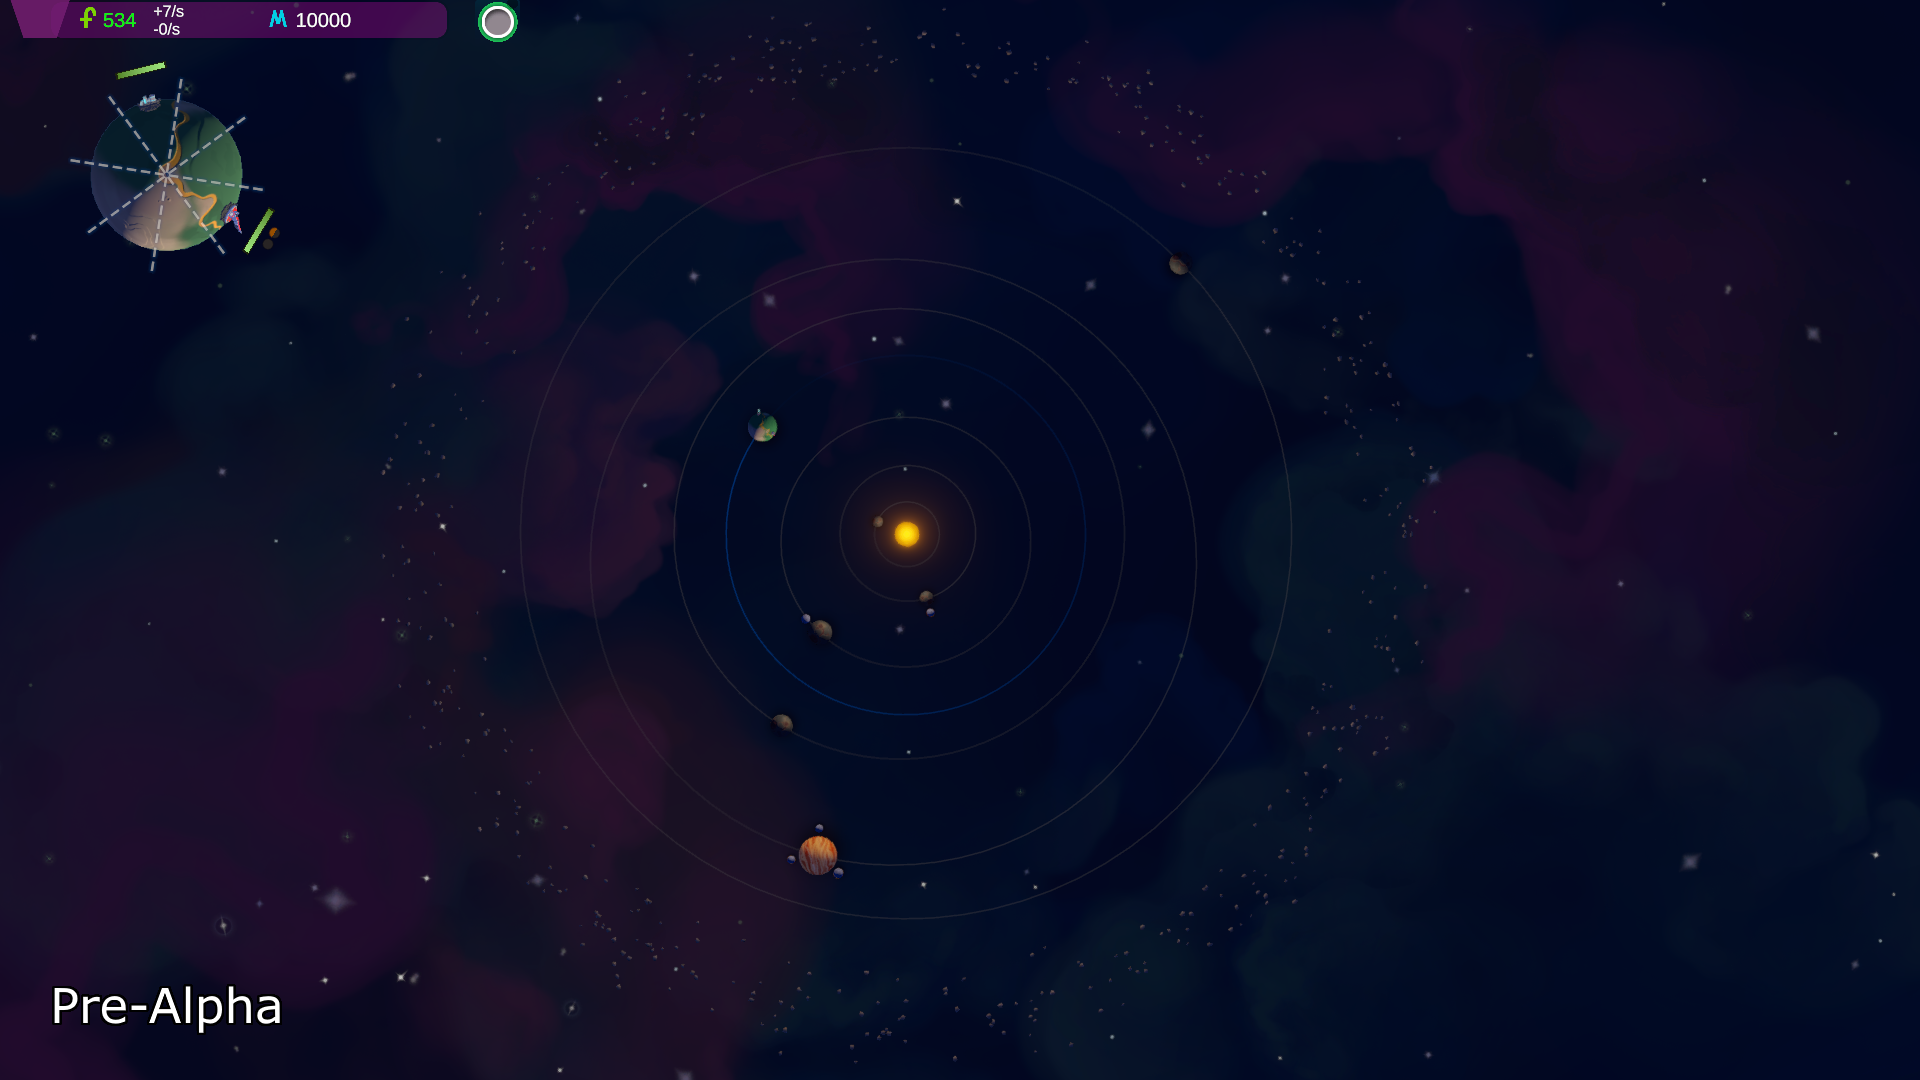 wrb_AsteroidBelt_prealpha